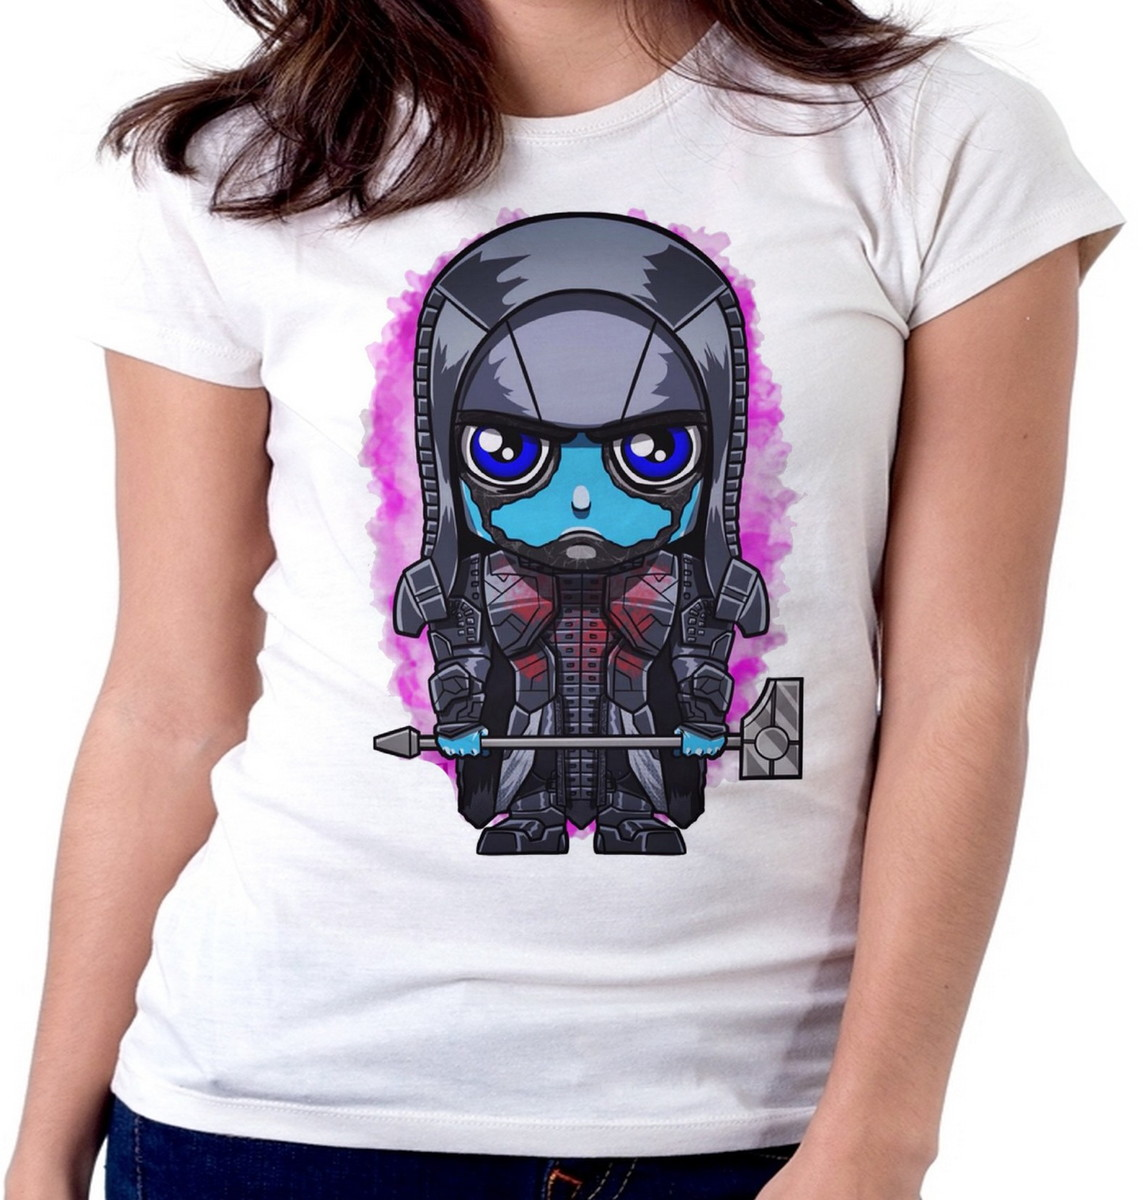 b24a4df12f Blusa feminina baby look camiseta Ronan Acusador Guardiões no Elo7 ...